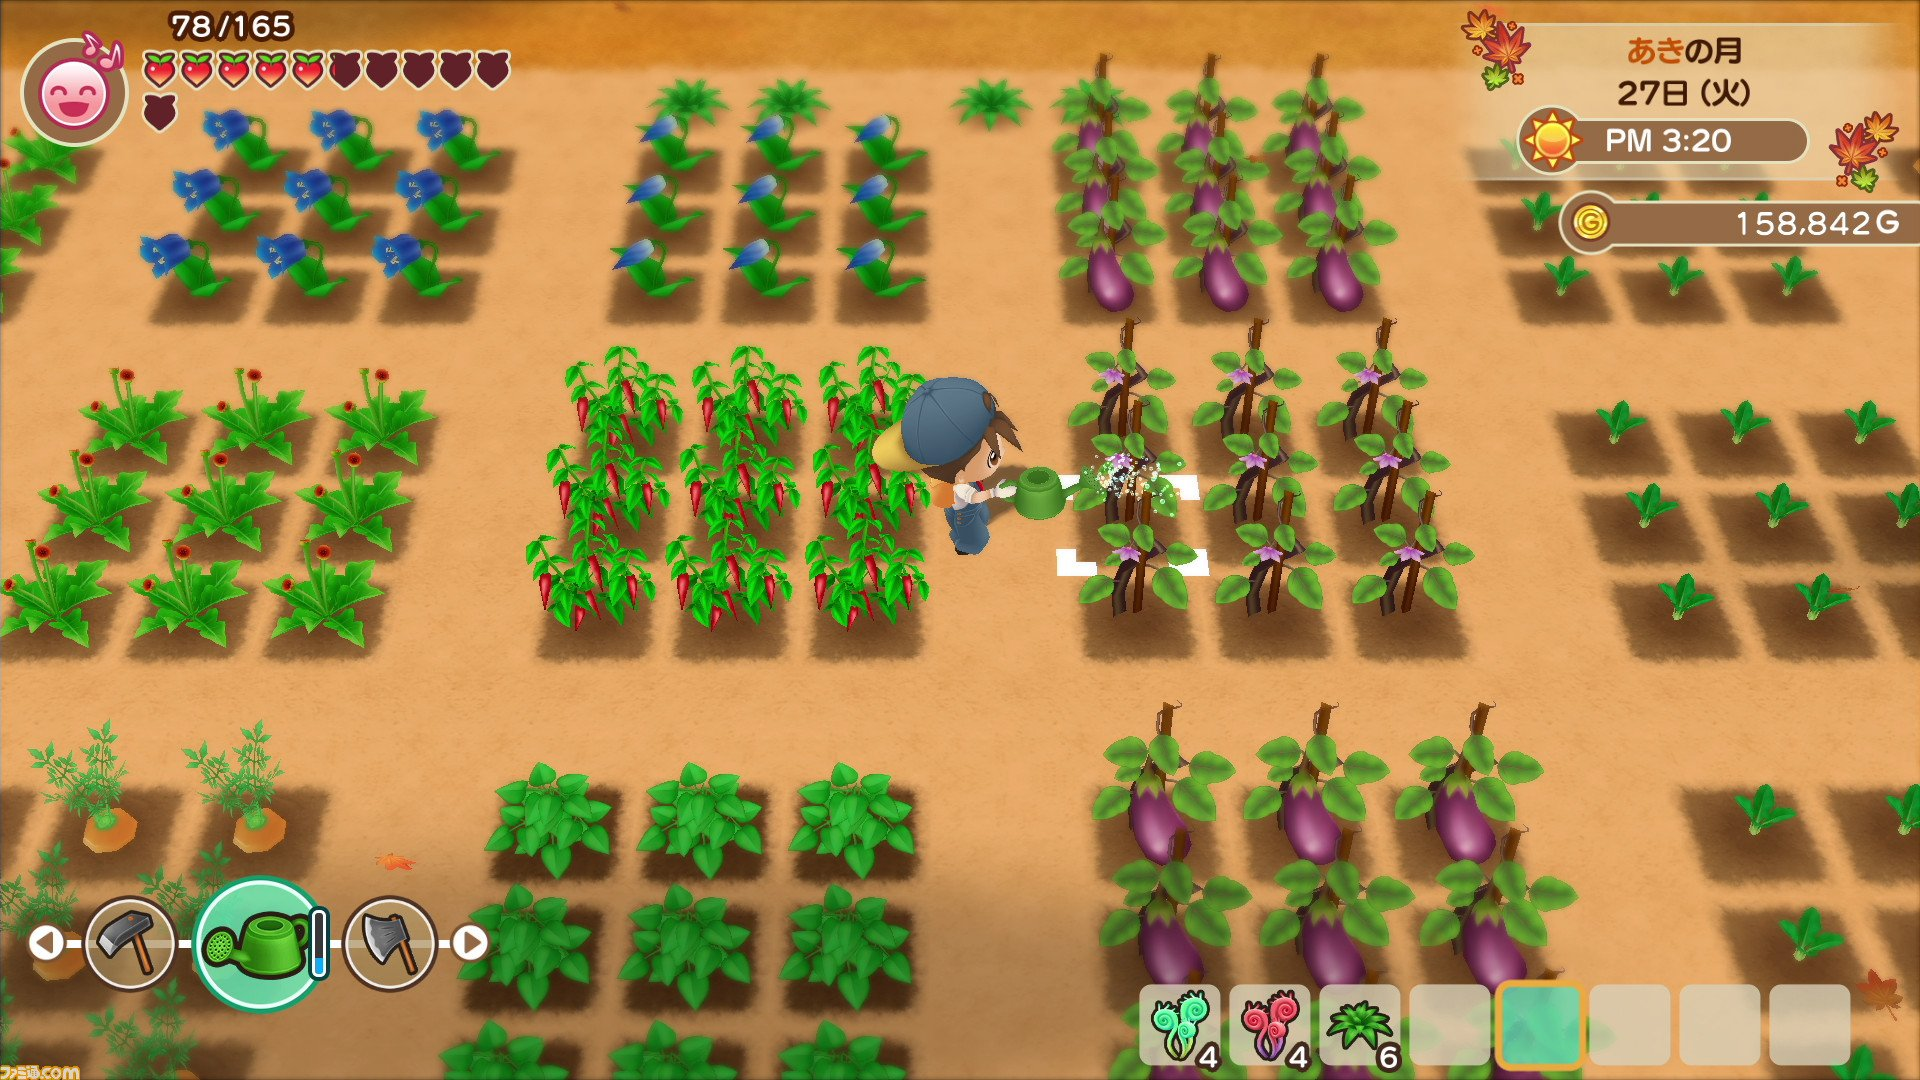 Harvest Moon Switch remaster